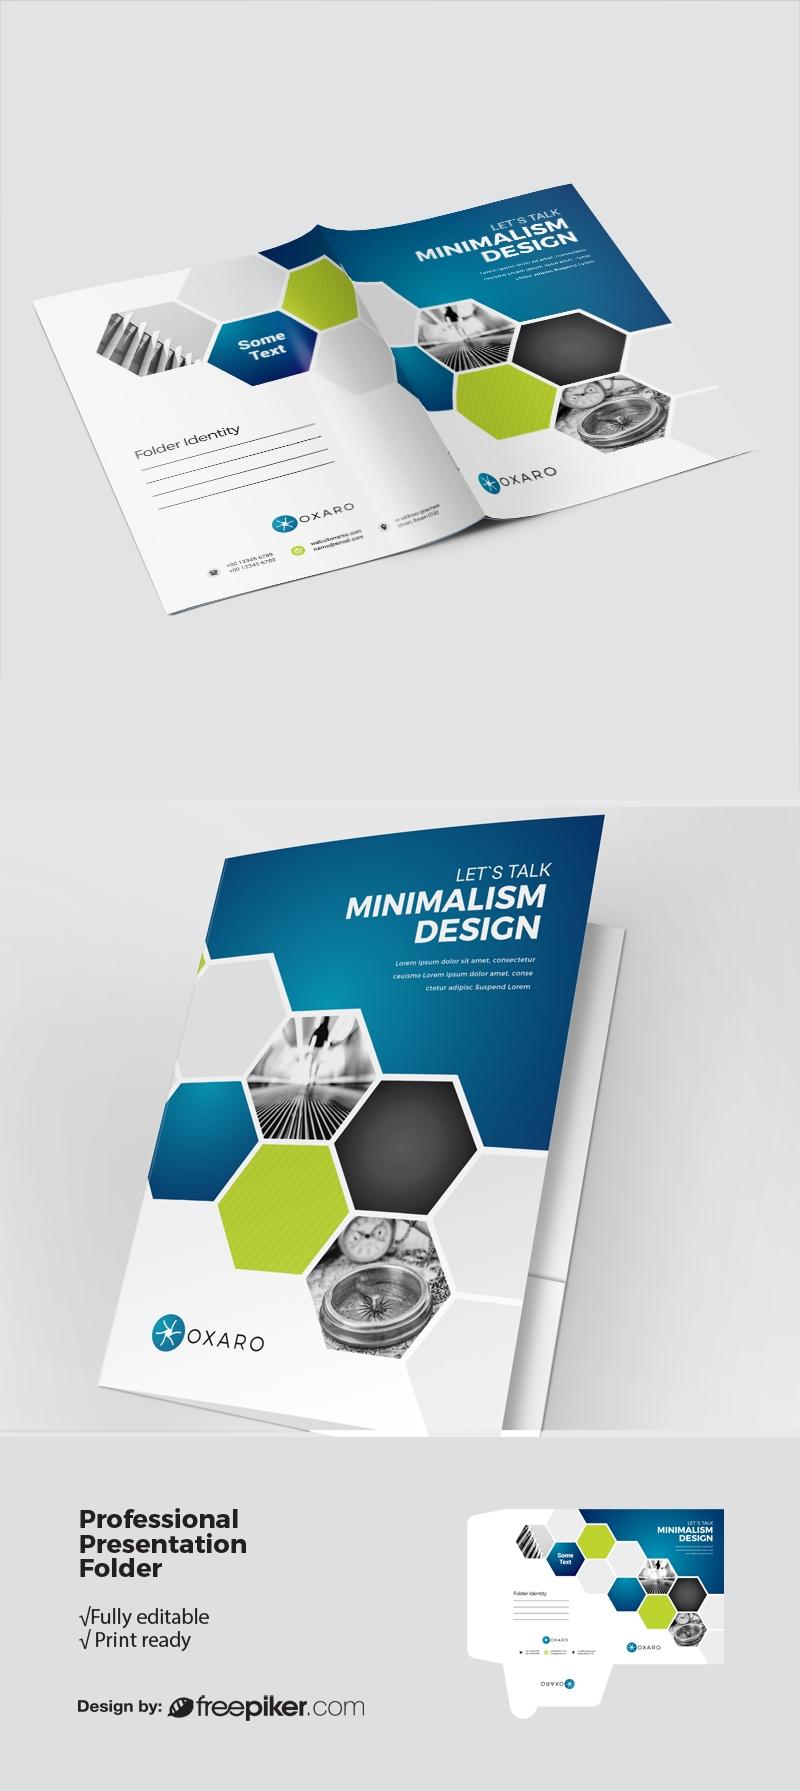 Blue Accent Infographic Business Presentation Folder